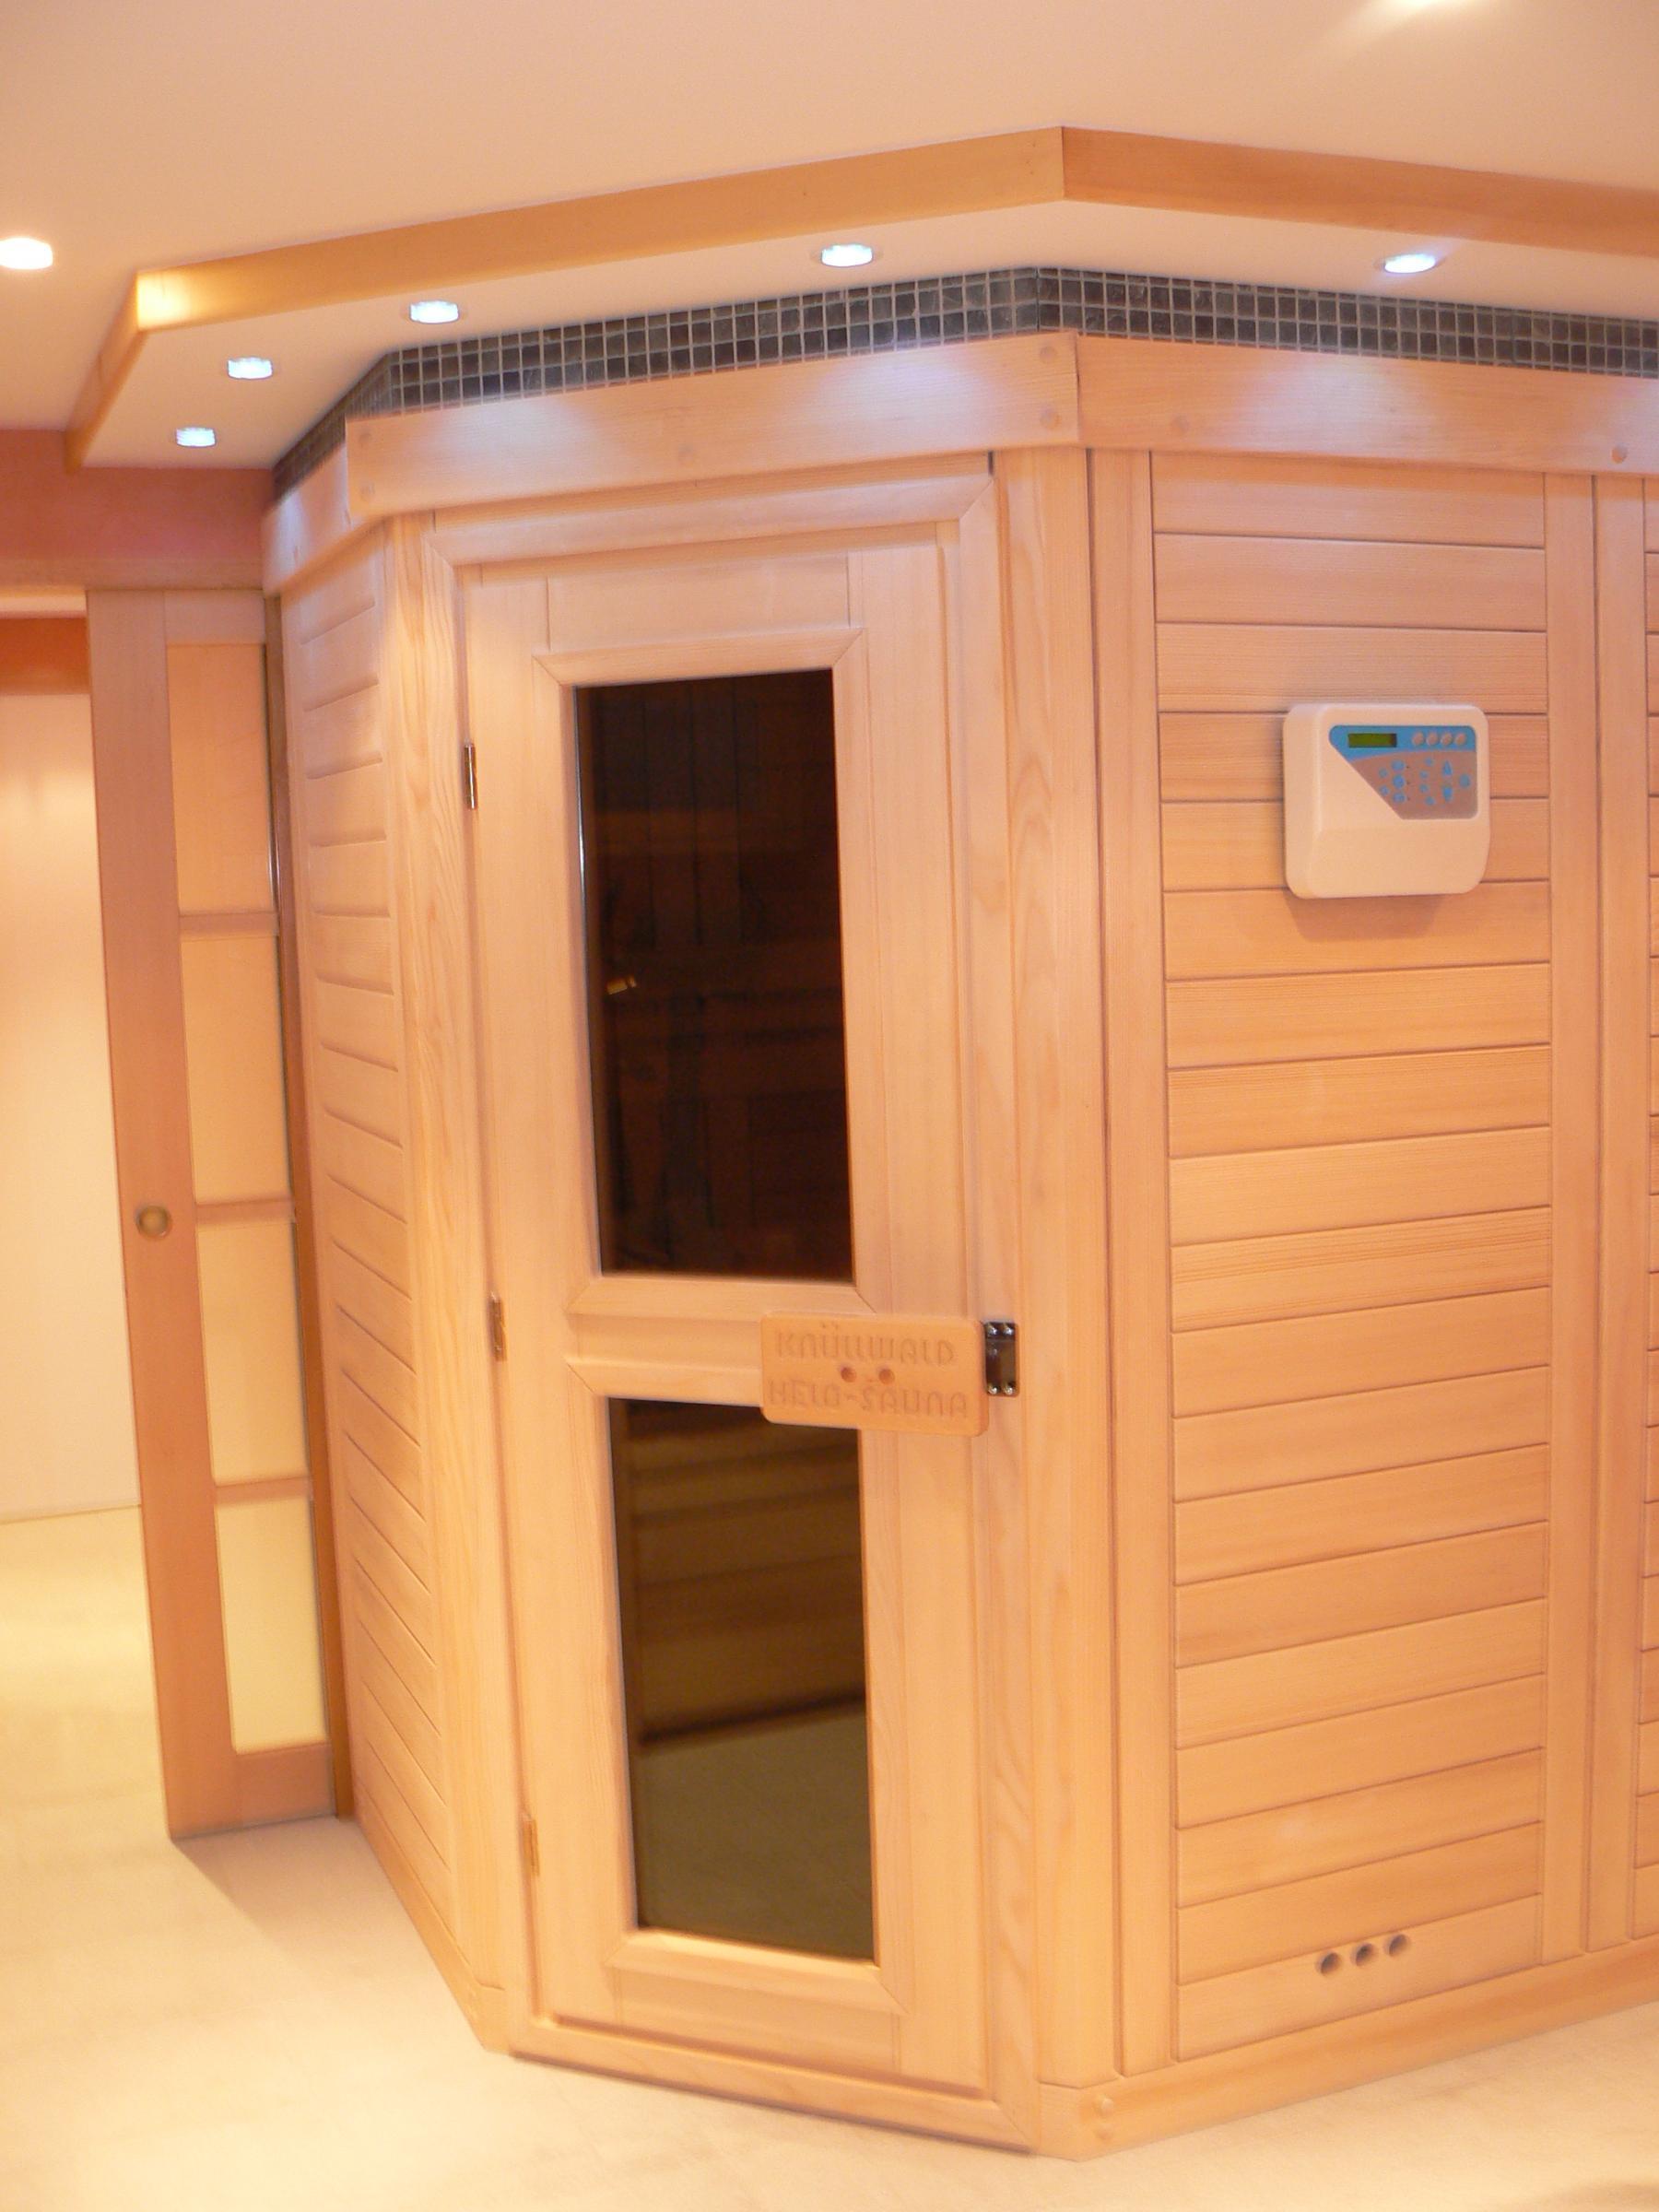 Maison Sauna sauna, cabine infrarouge, lons le saunier jura- ain- saône et loire